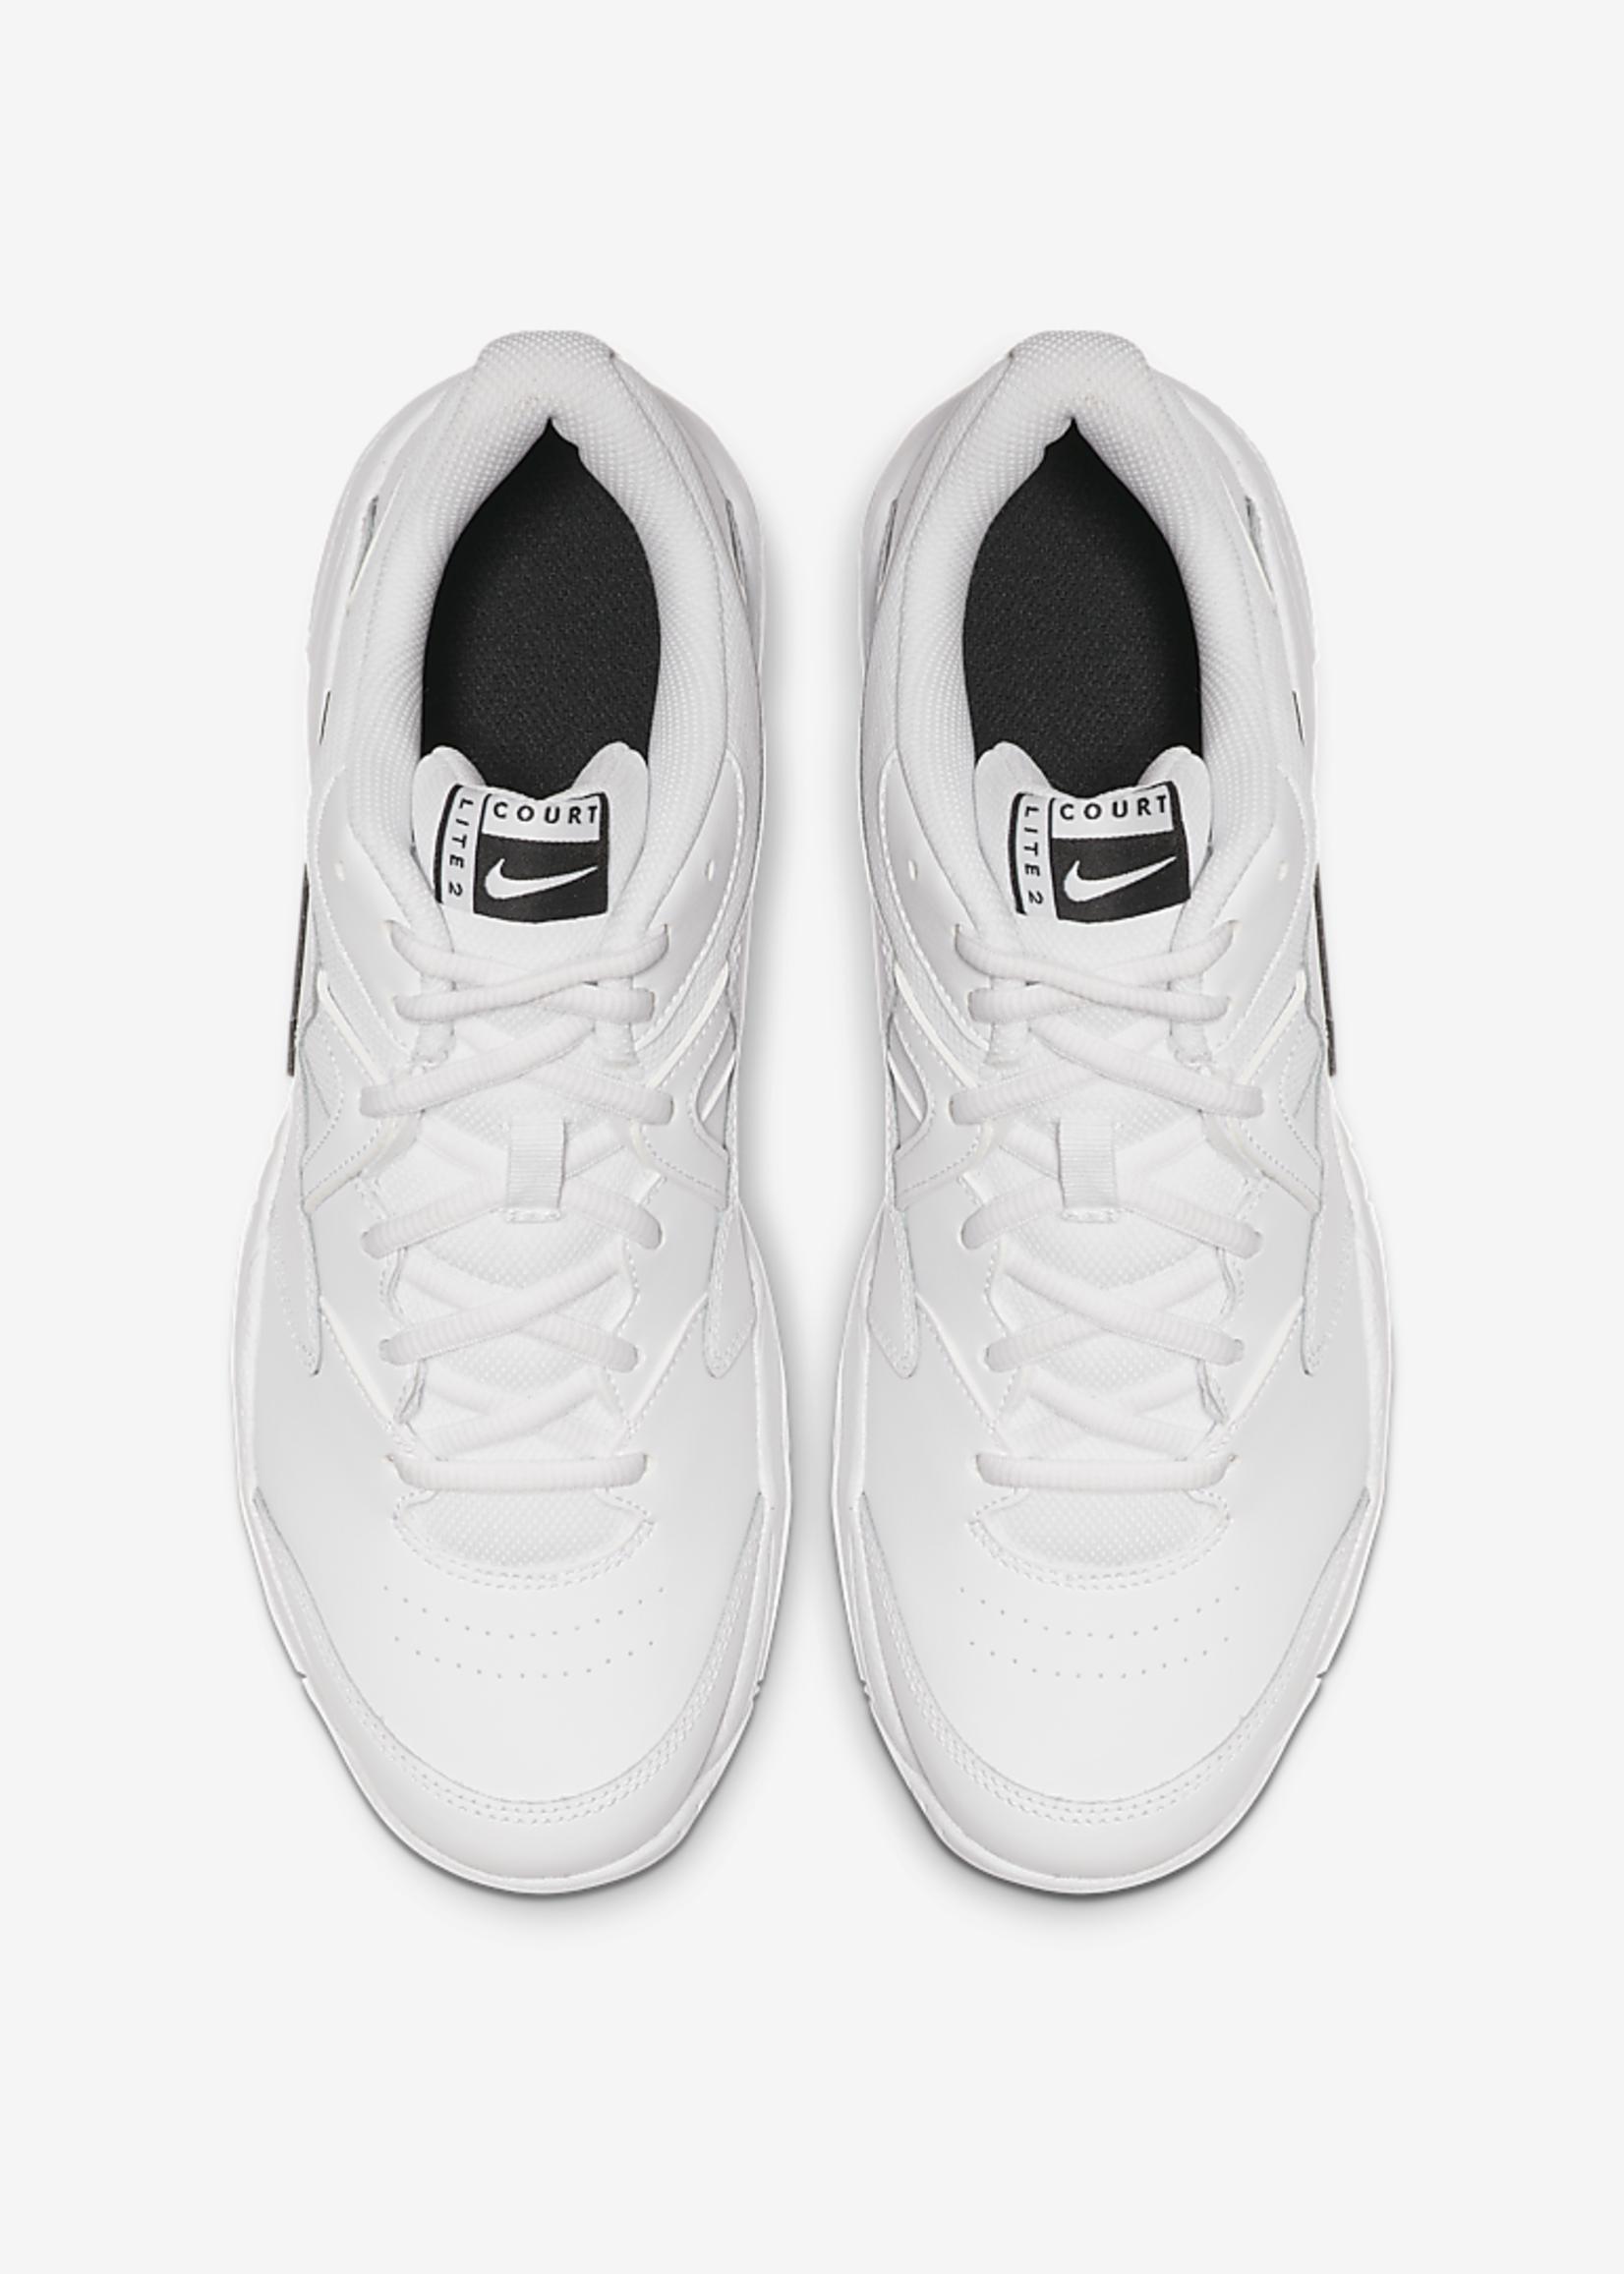 Nike MEN'S NIKECOURT LITE 2 TENNIS SHOES AR8836